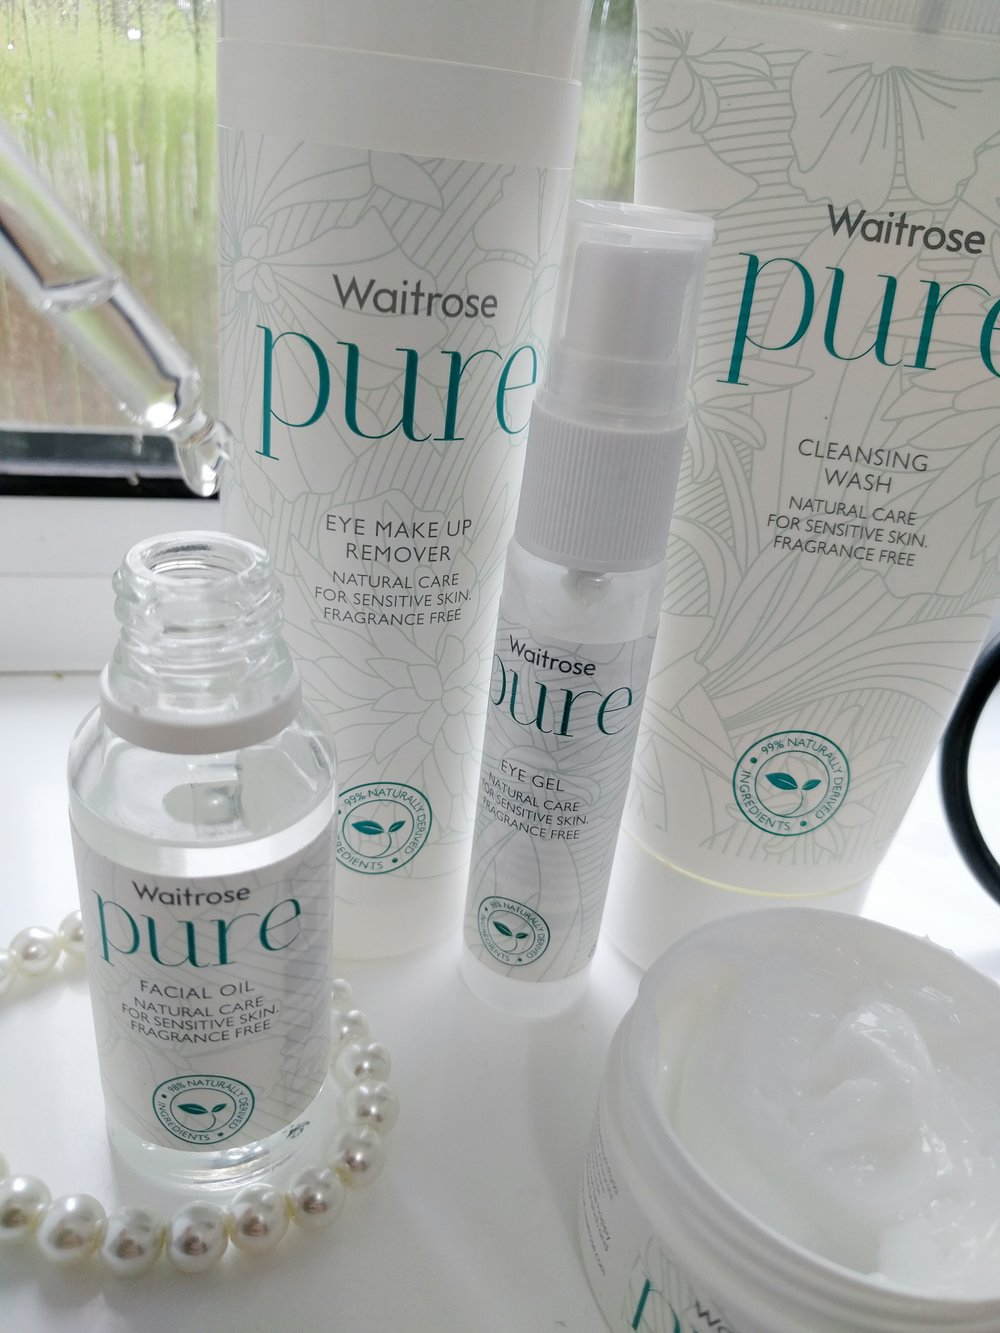 Waitrose Pure skincare image 2.jpg